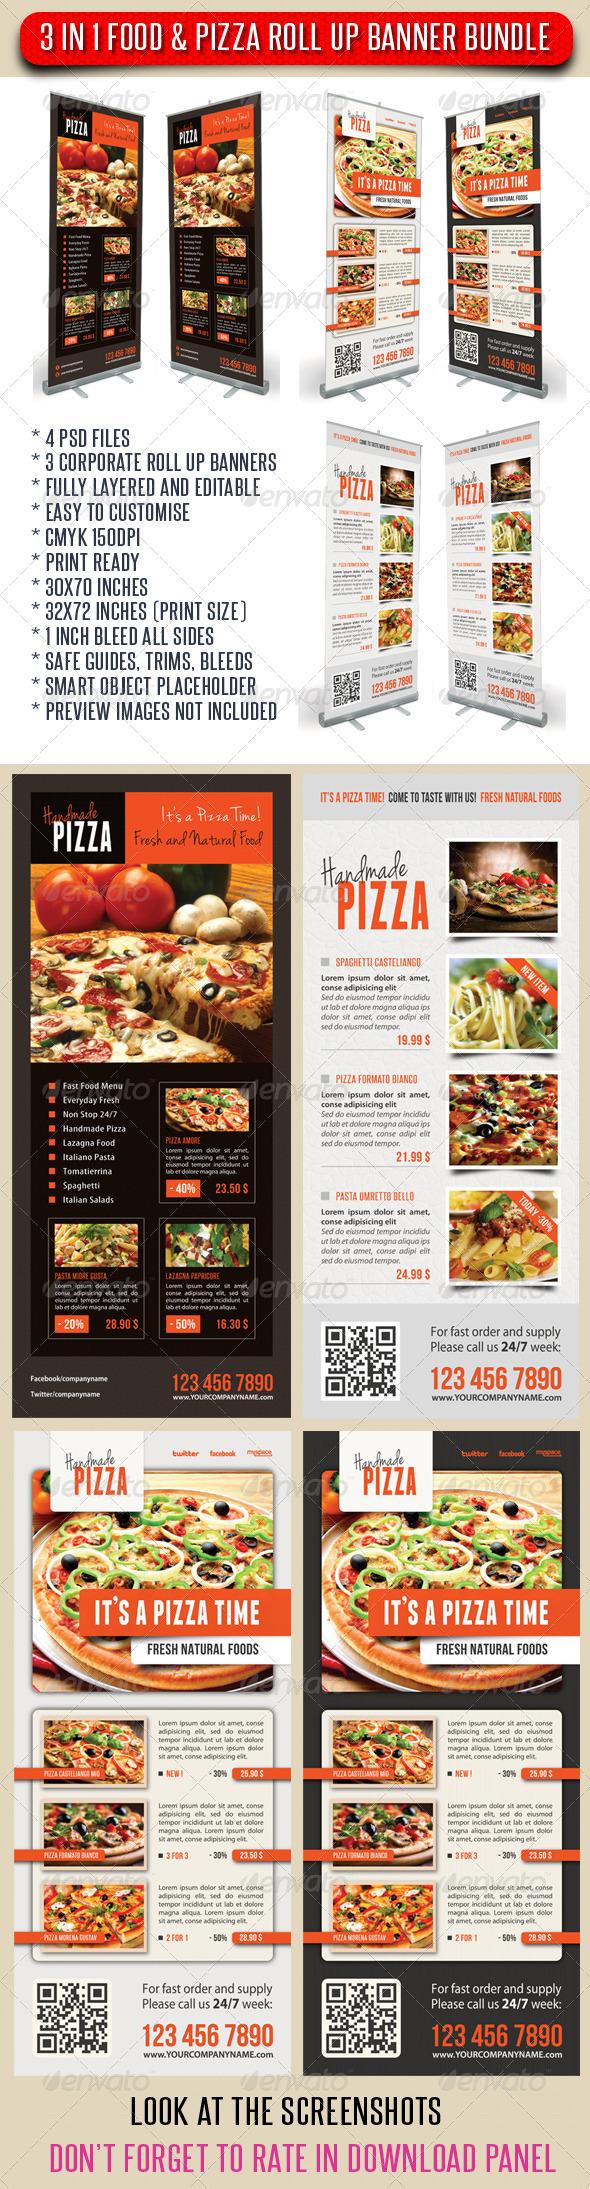 3 in 1 Food And Pizza Menu Banner Bundle 03